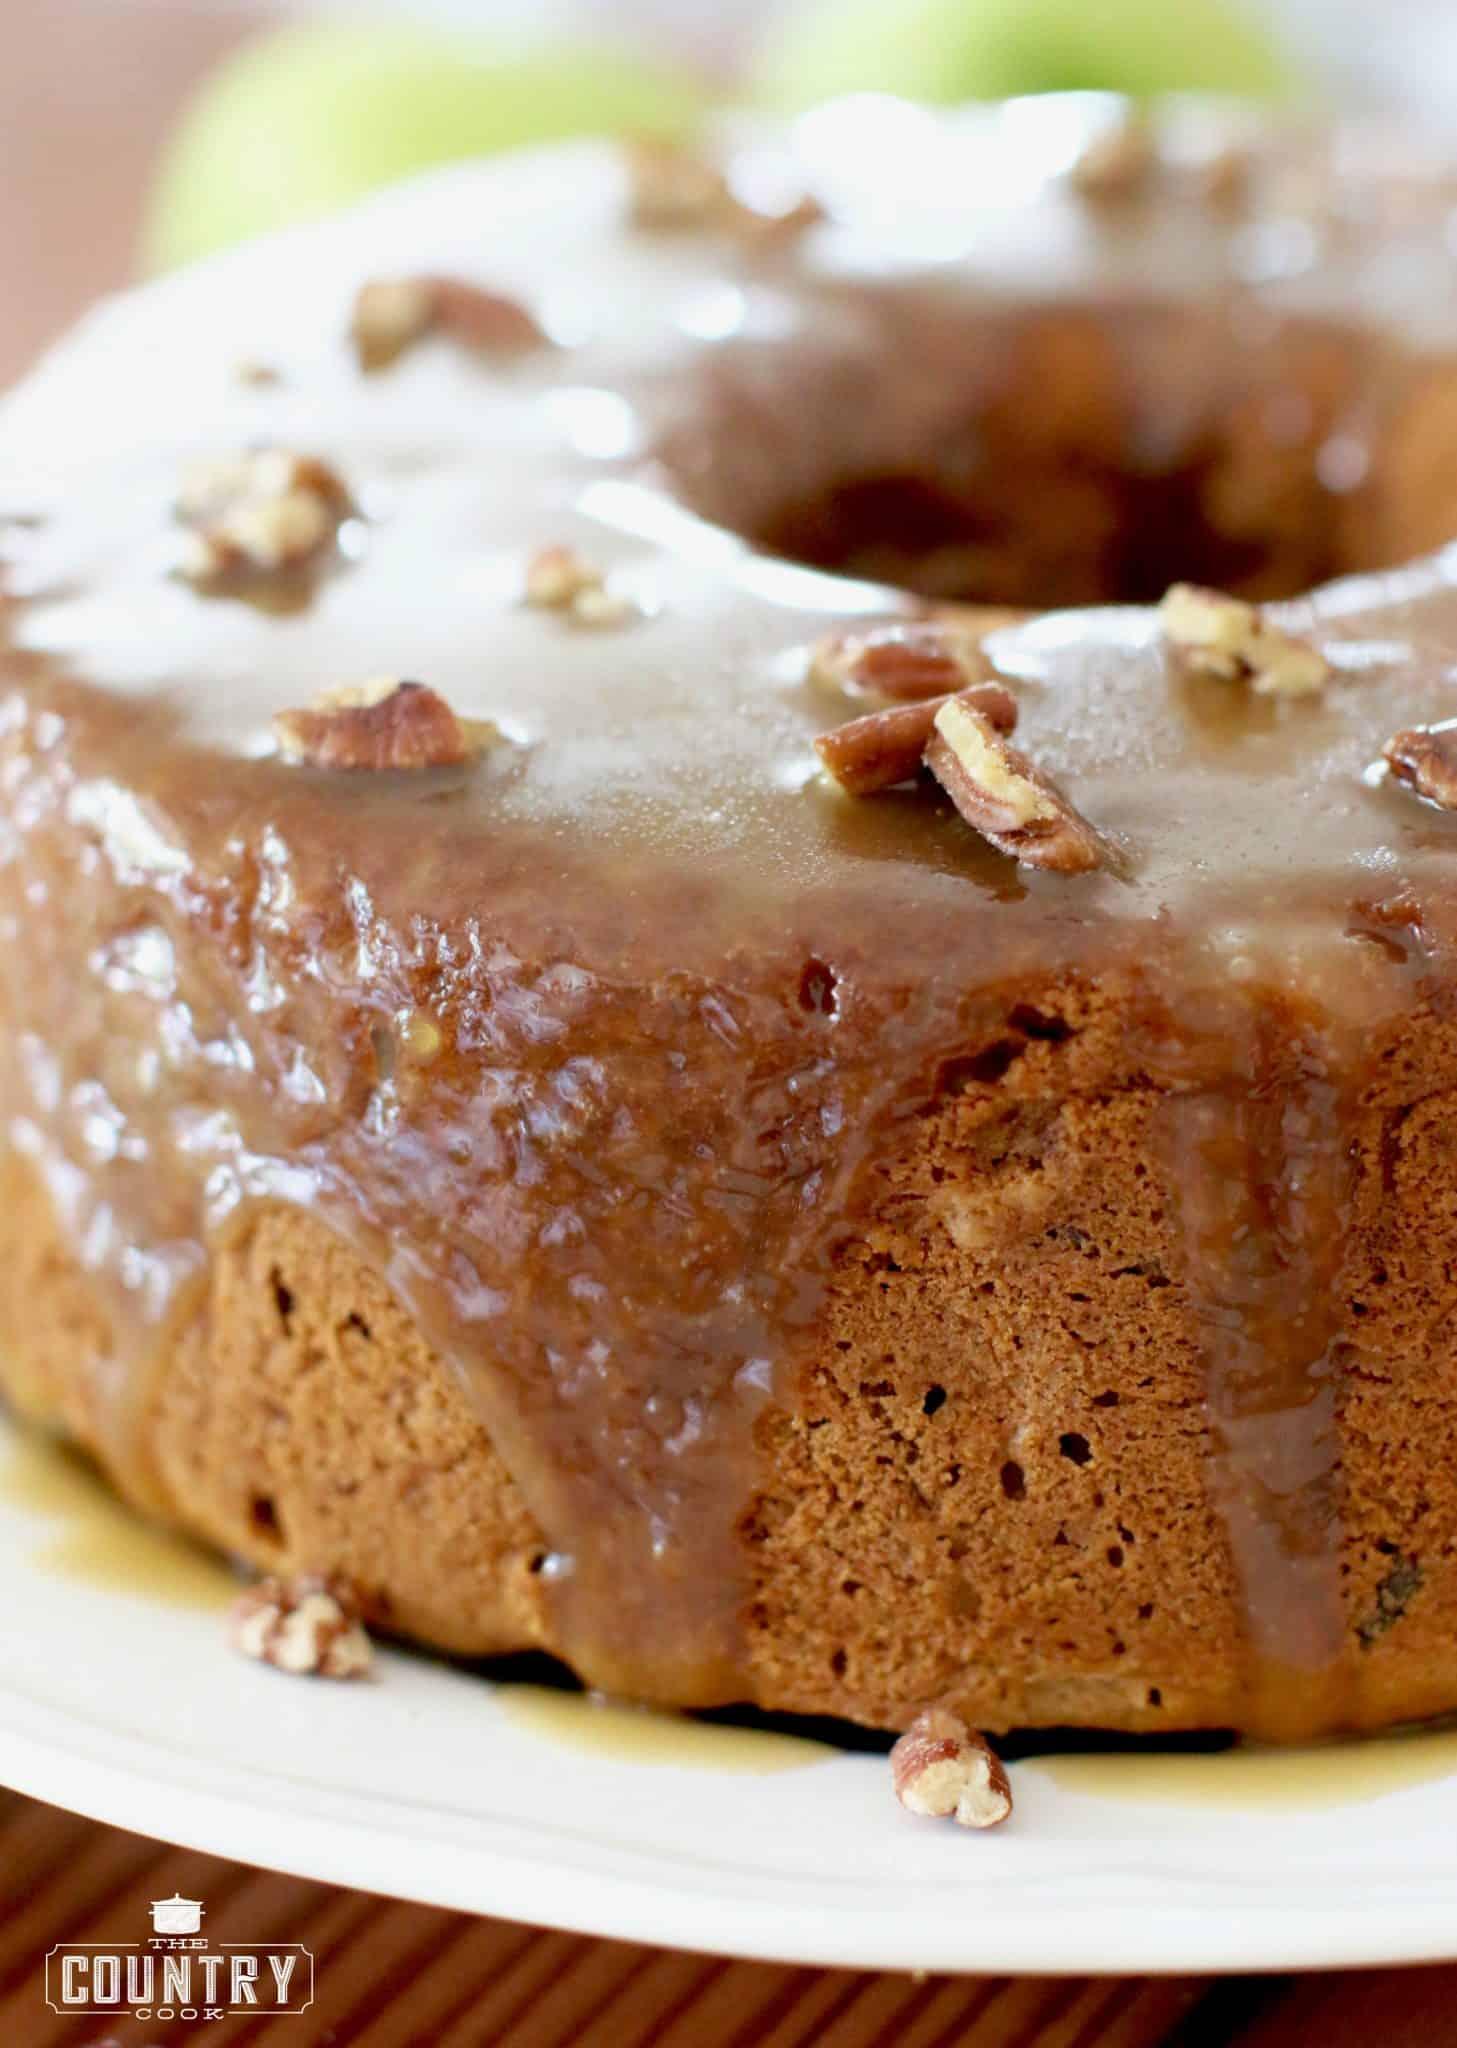 Homemade Caramel Apple Cake shown fully baked and glazed on a large white serving platter.